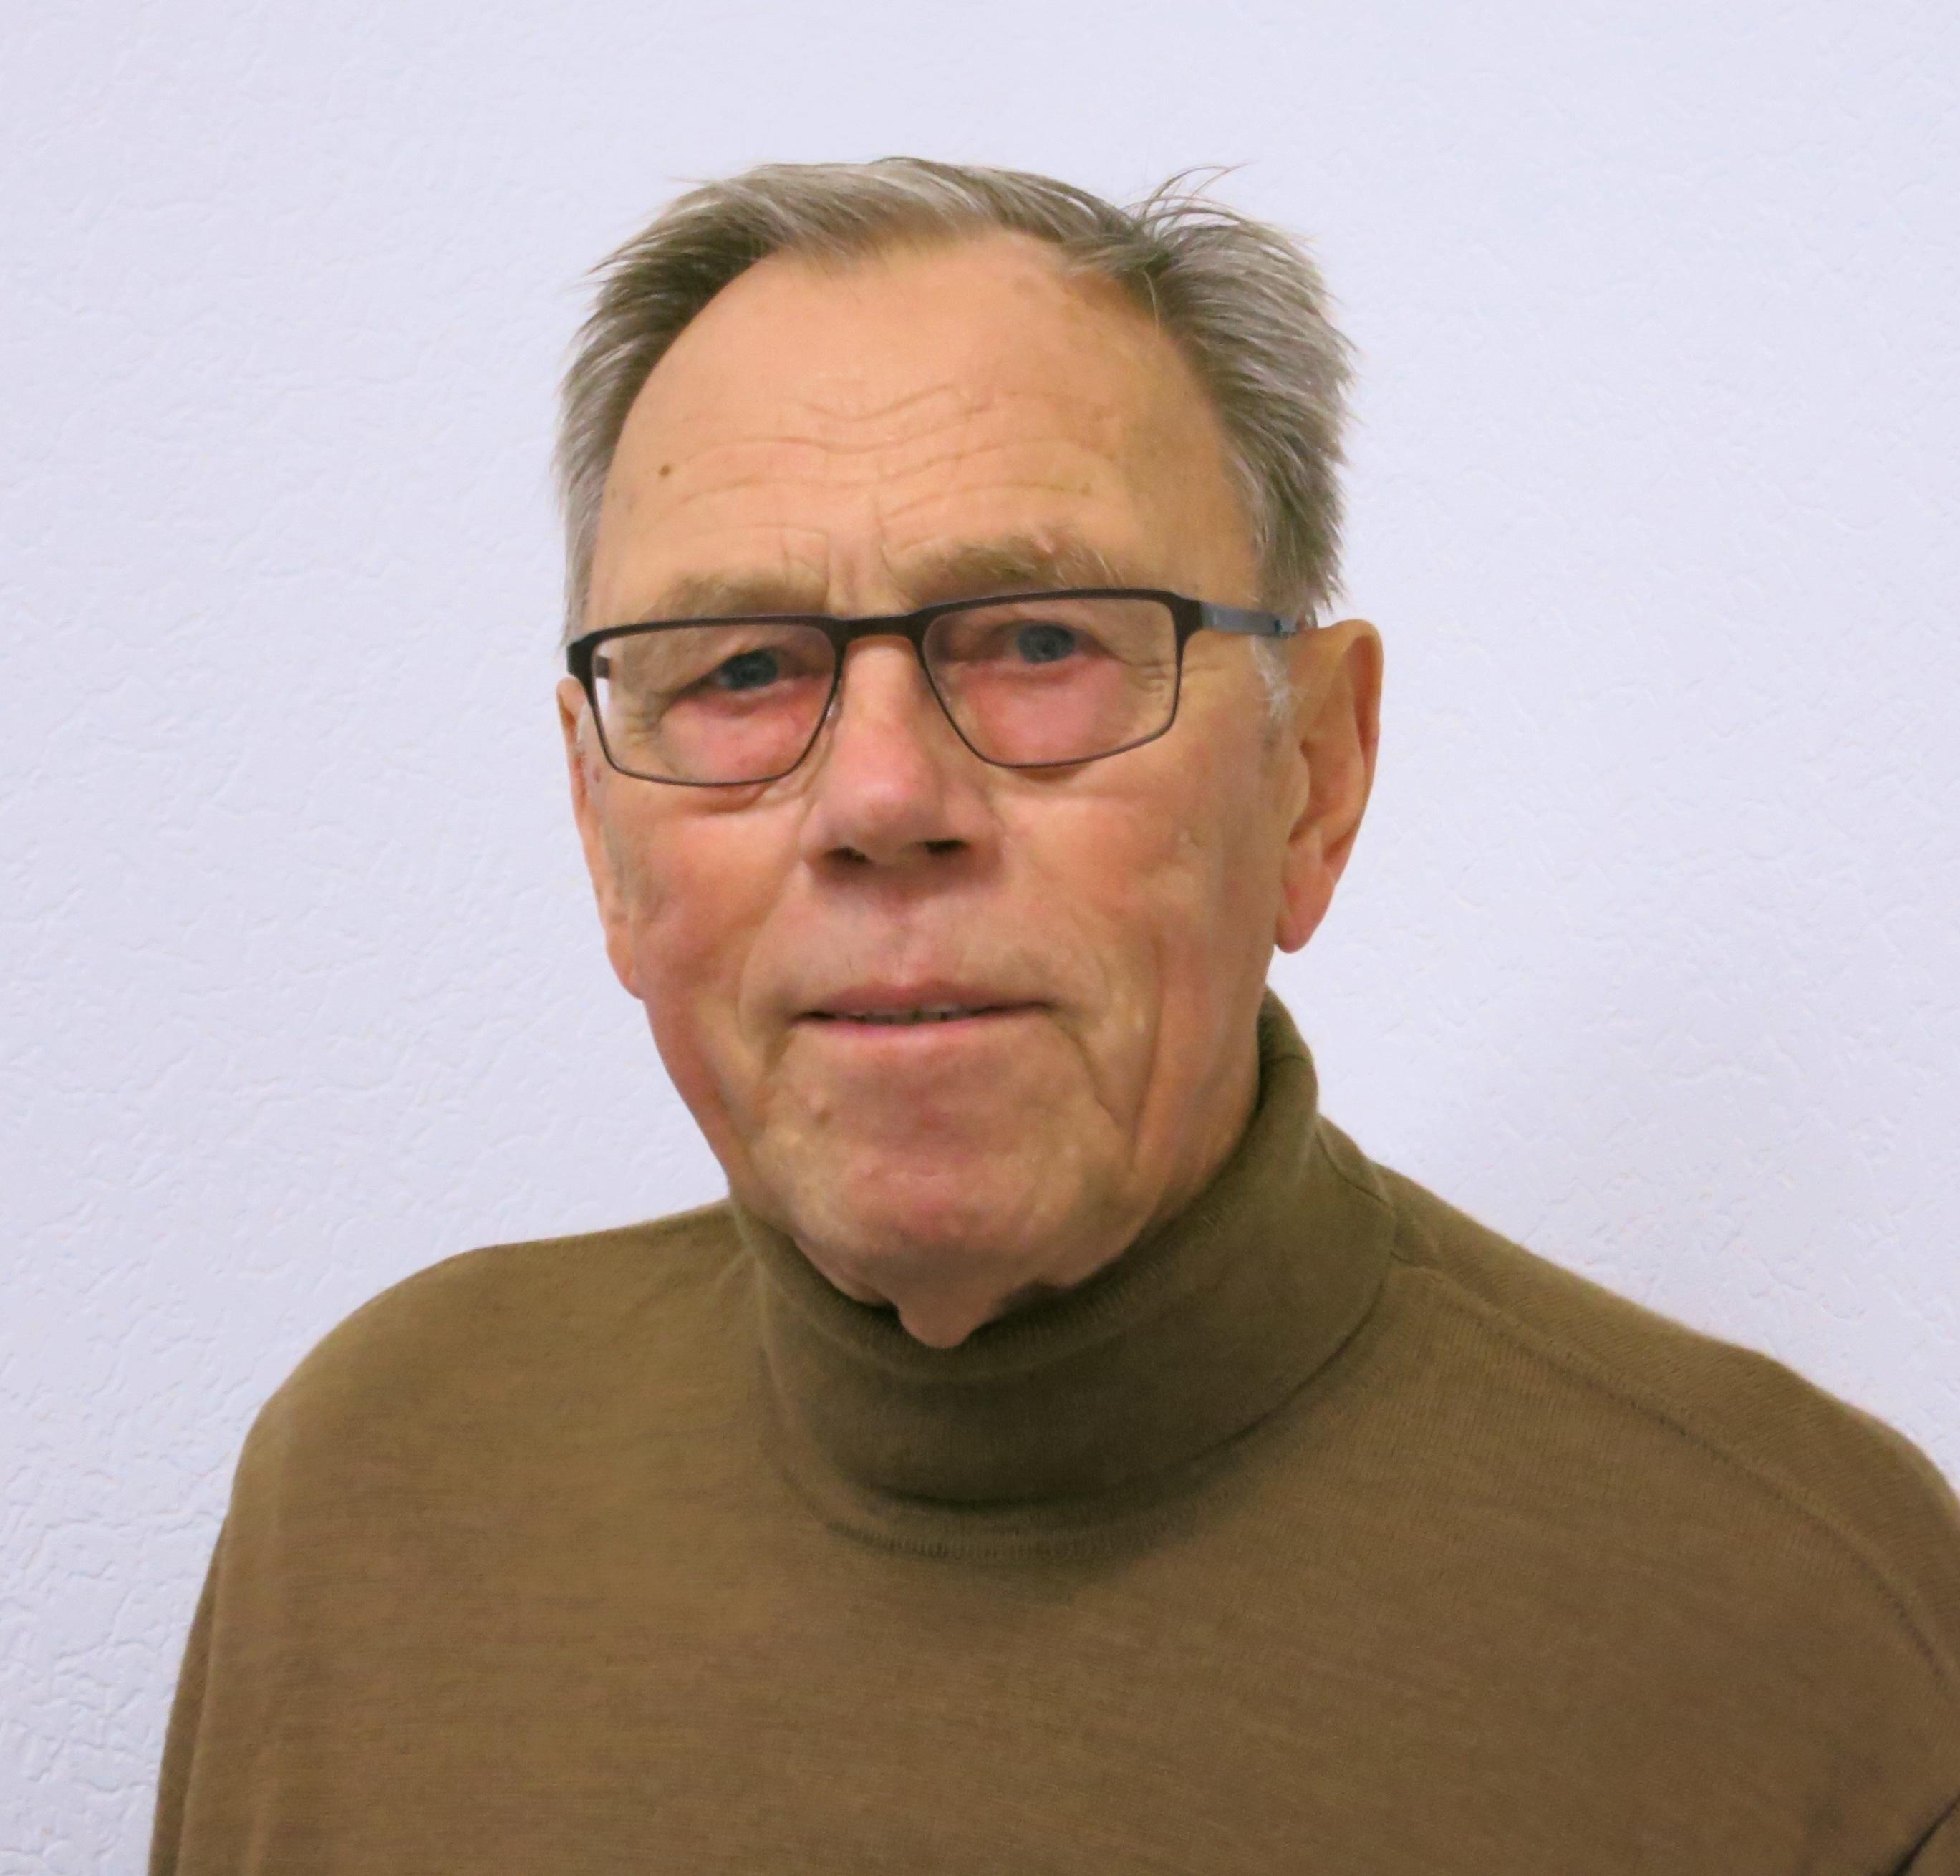 Rolf Strohmenger